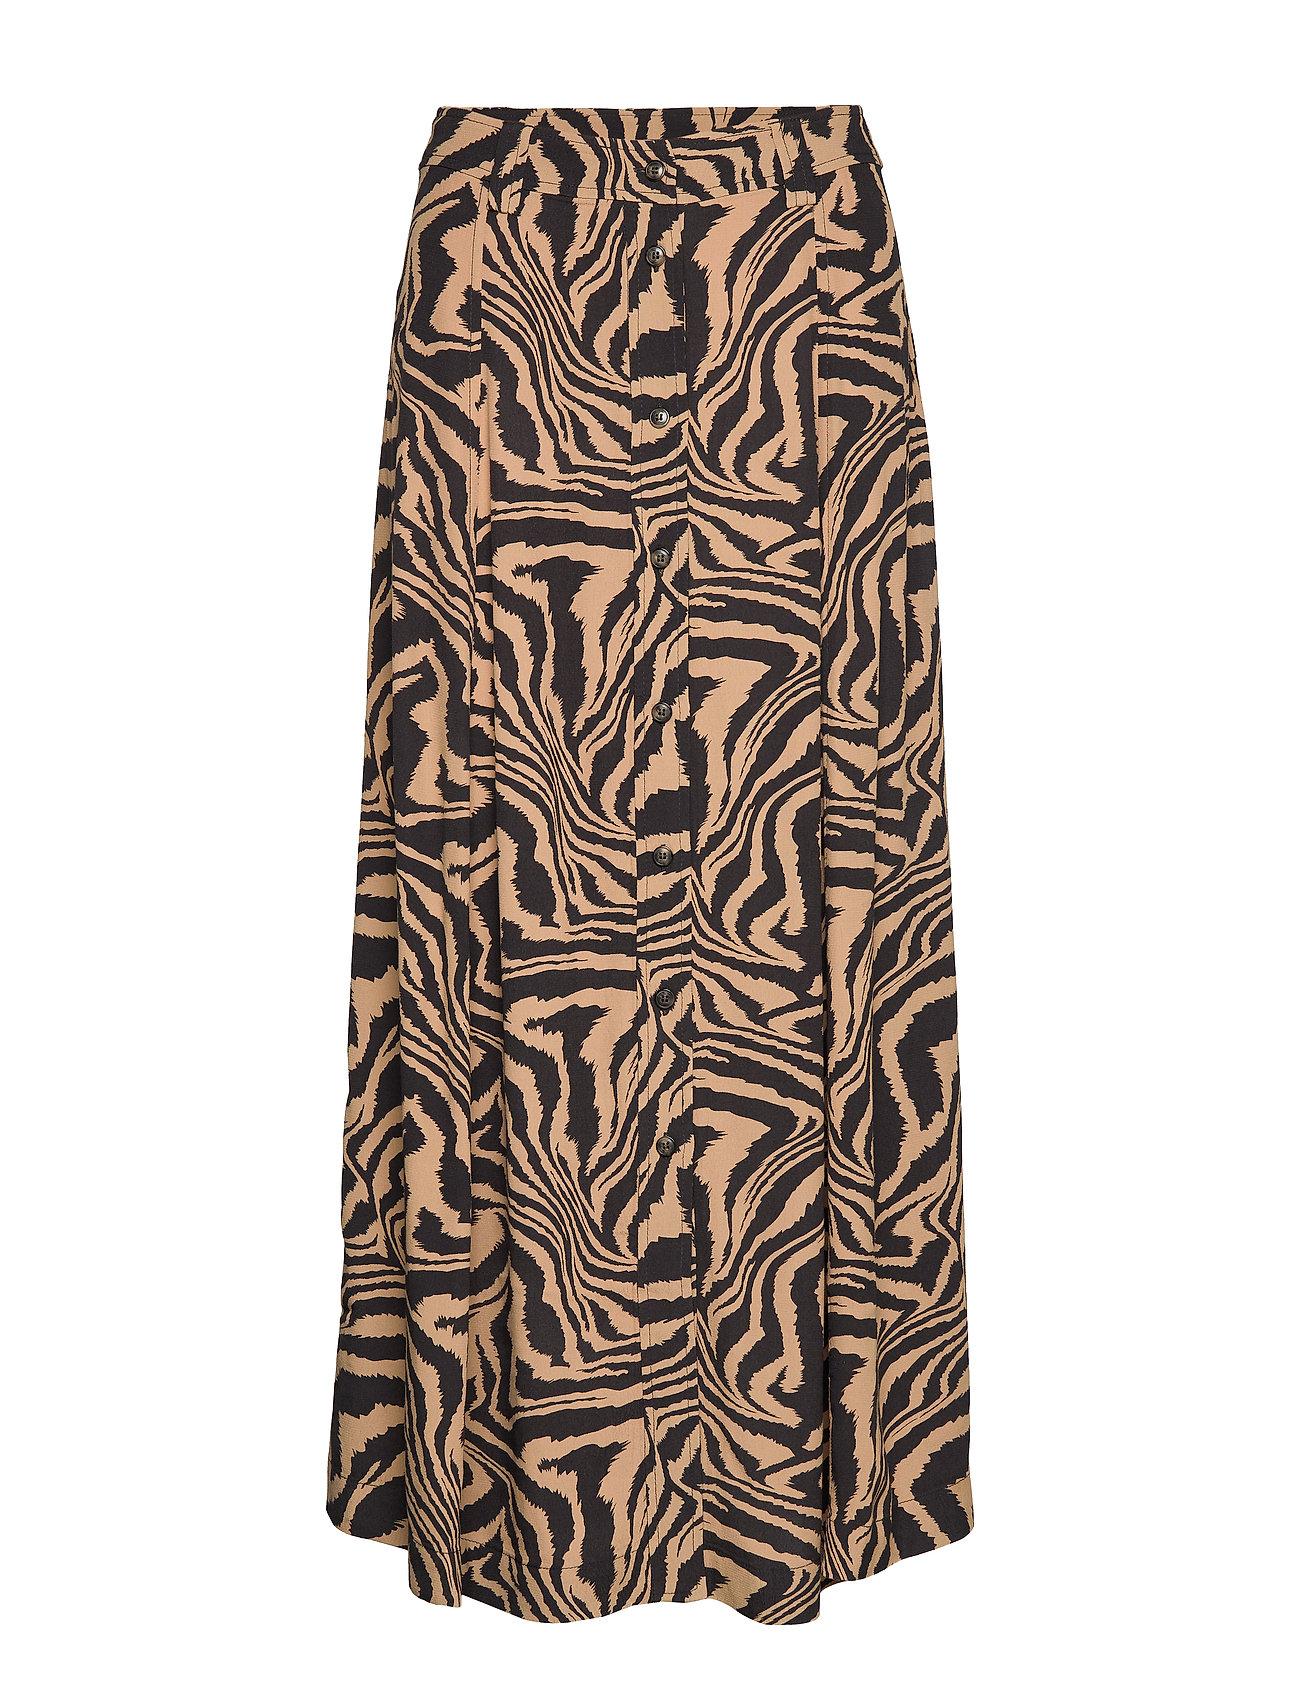 Ganni Printed Crepe Skirt - TANNIN